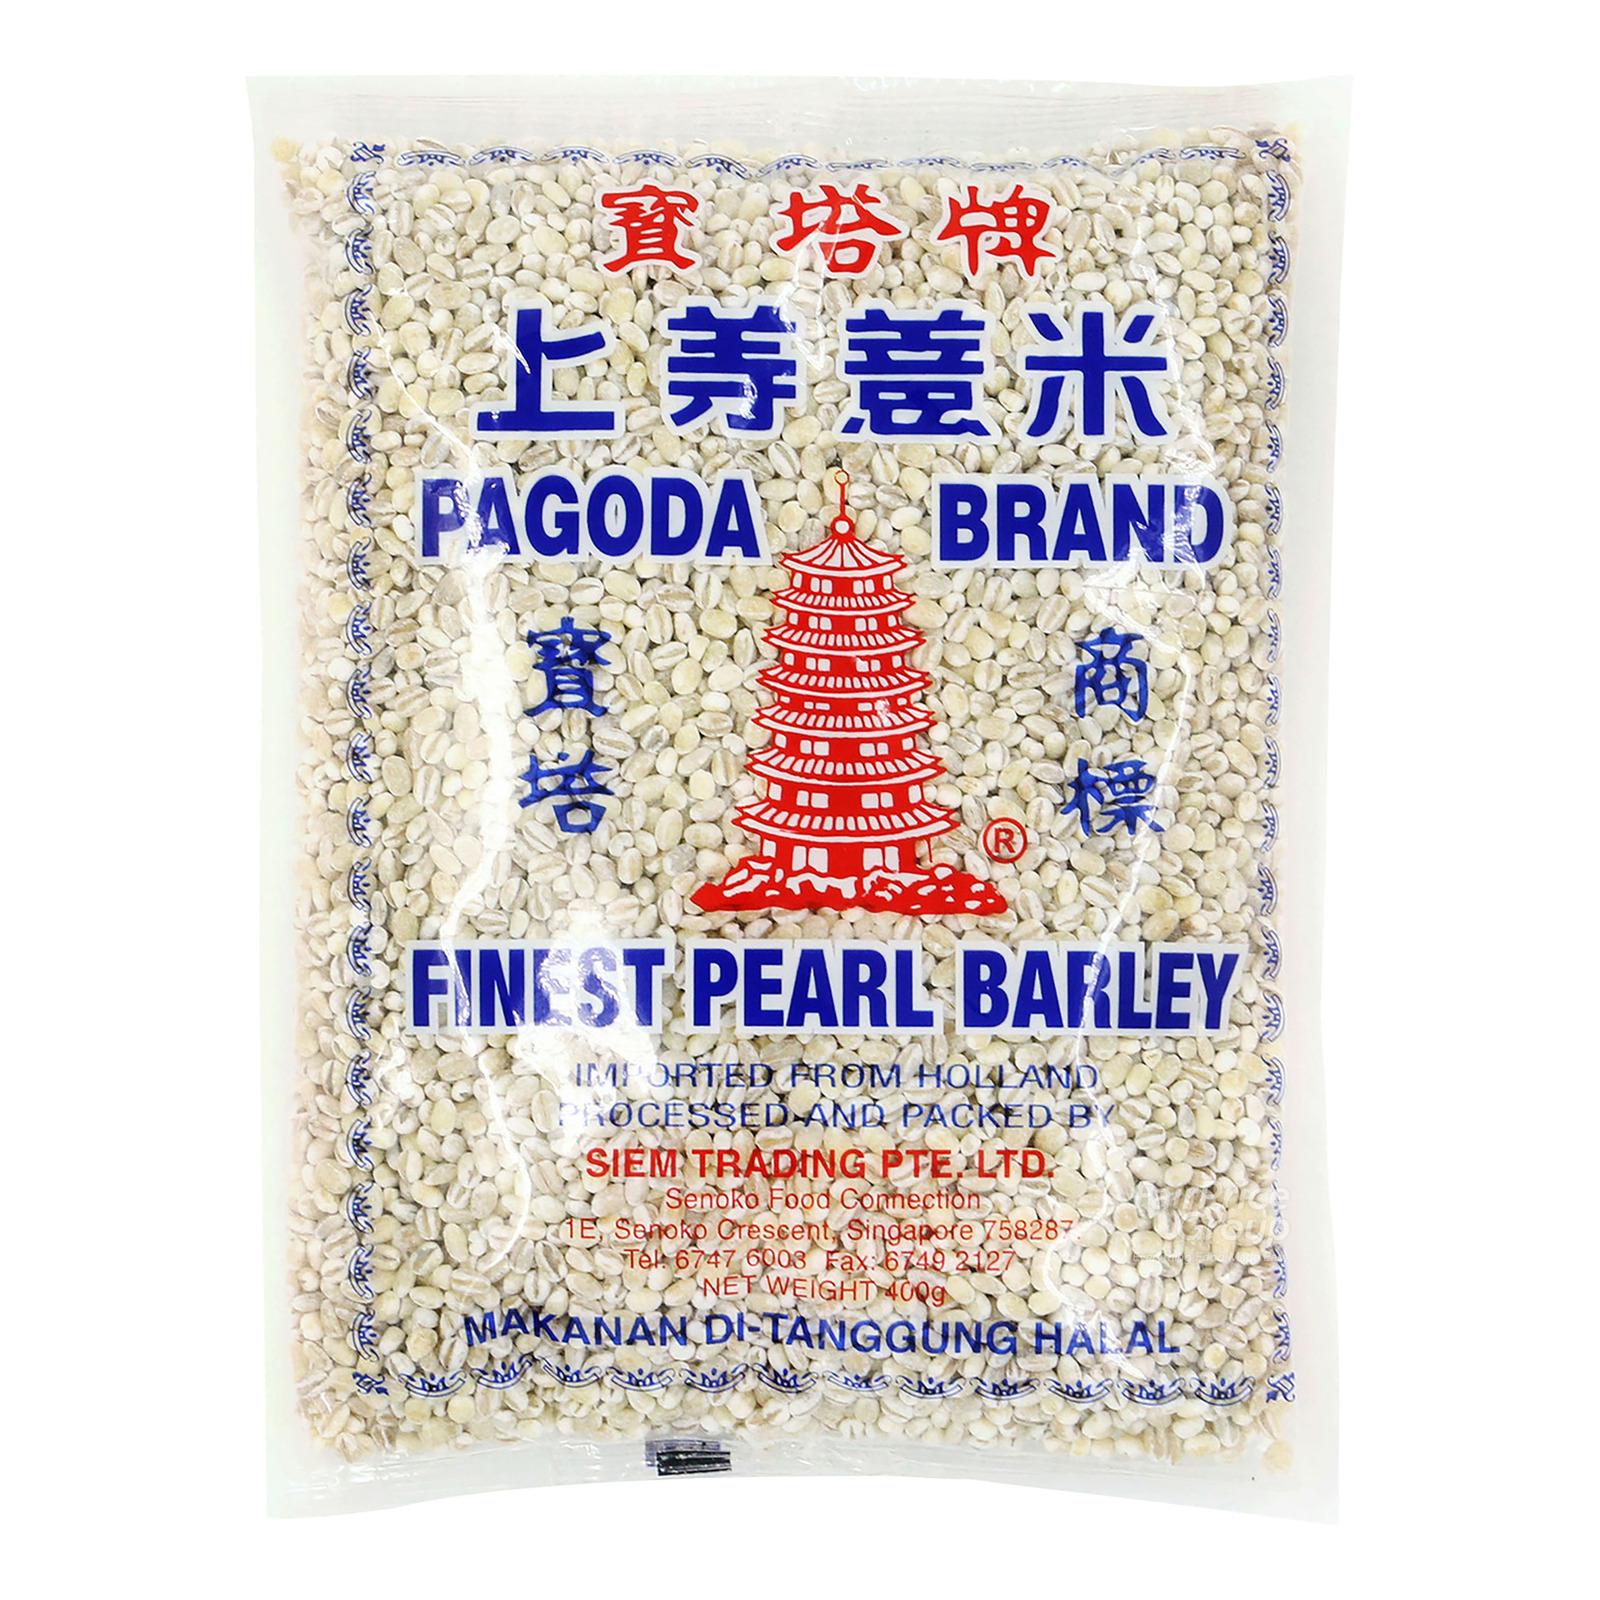 Pagoda Finest Pearl Barley